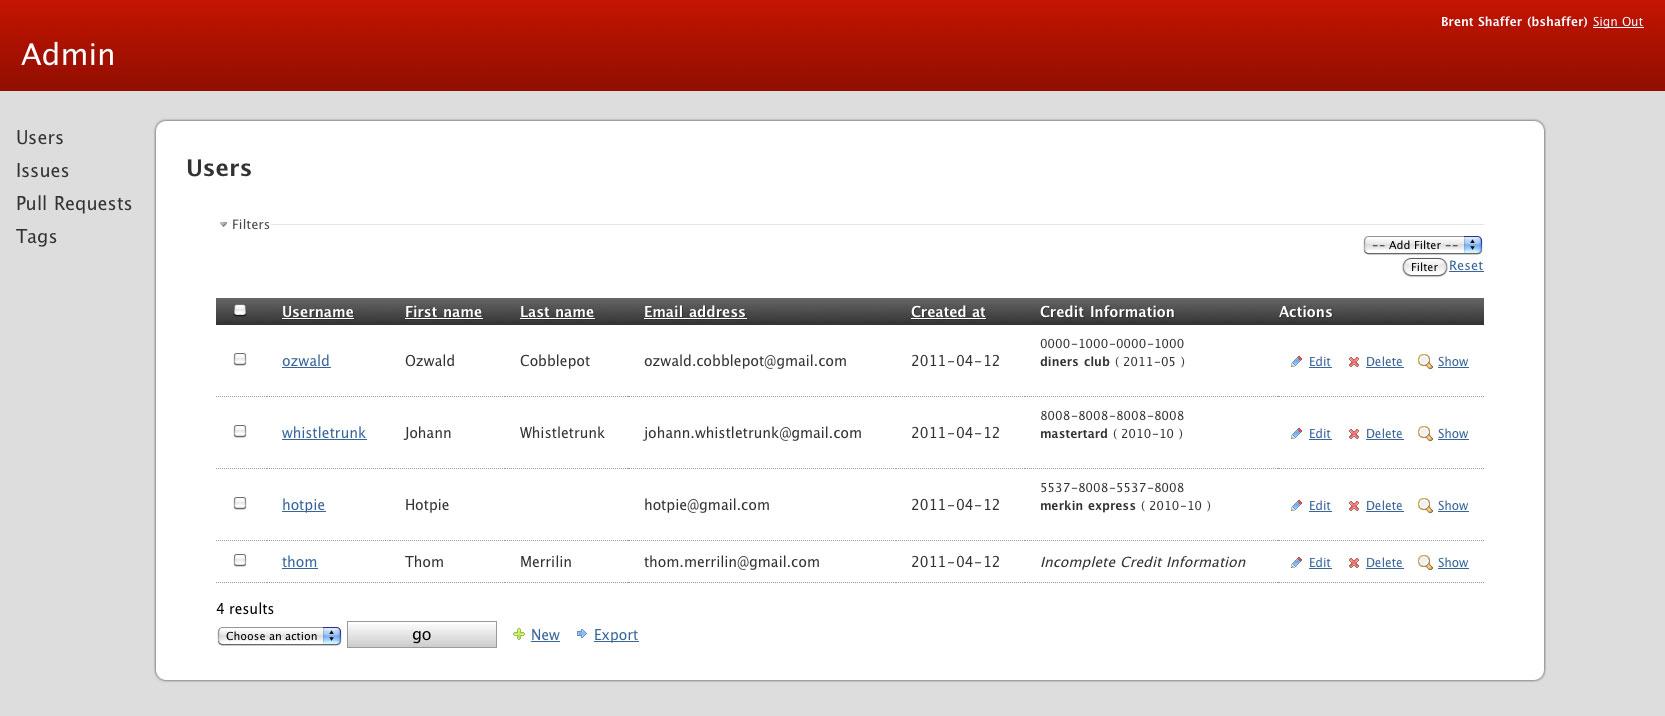 Hadori Screenshot for the List View